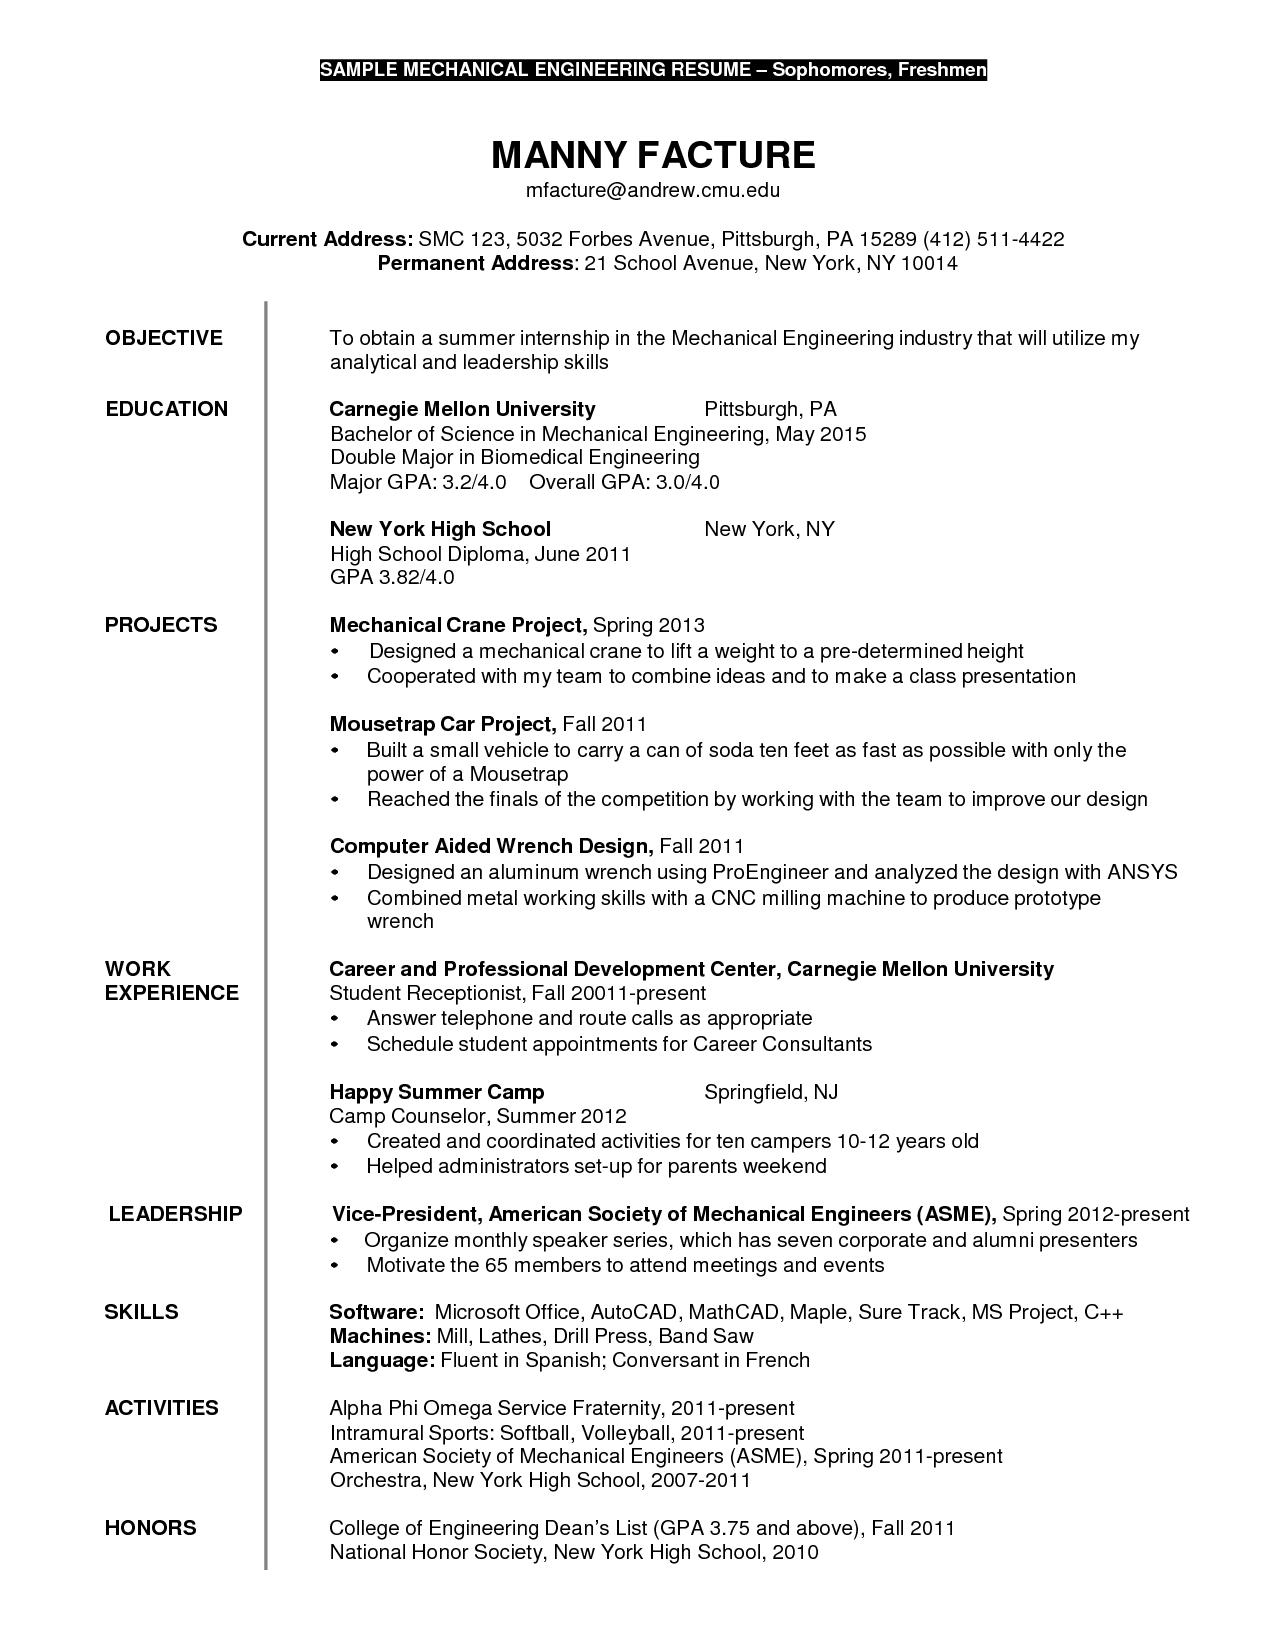 Mechanical Engineering Internship Resume Sle Sle Mechanical Engineering Resume 28 Images Mechanical Internship Resume Engineering Resume Resume Writing Tips